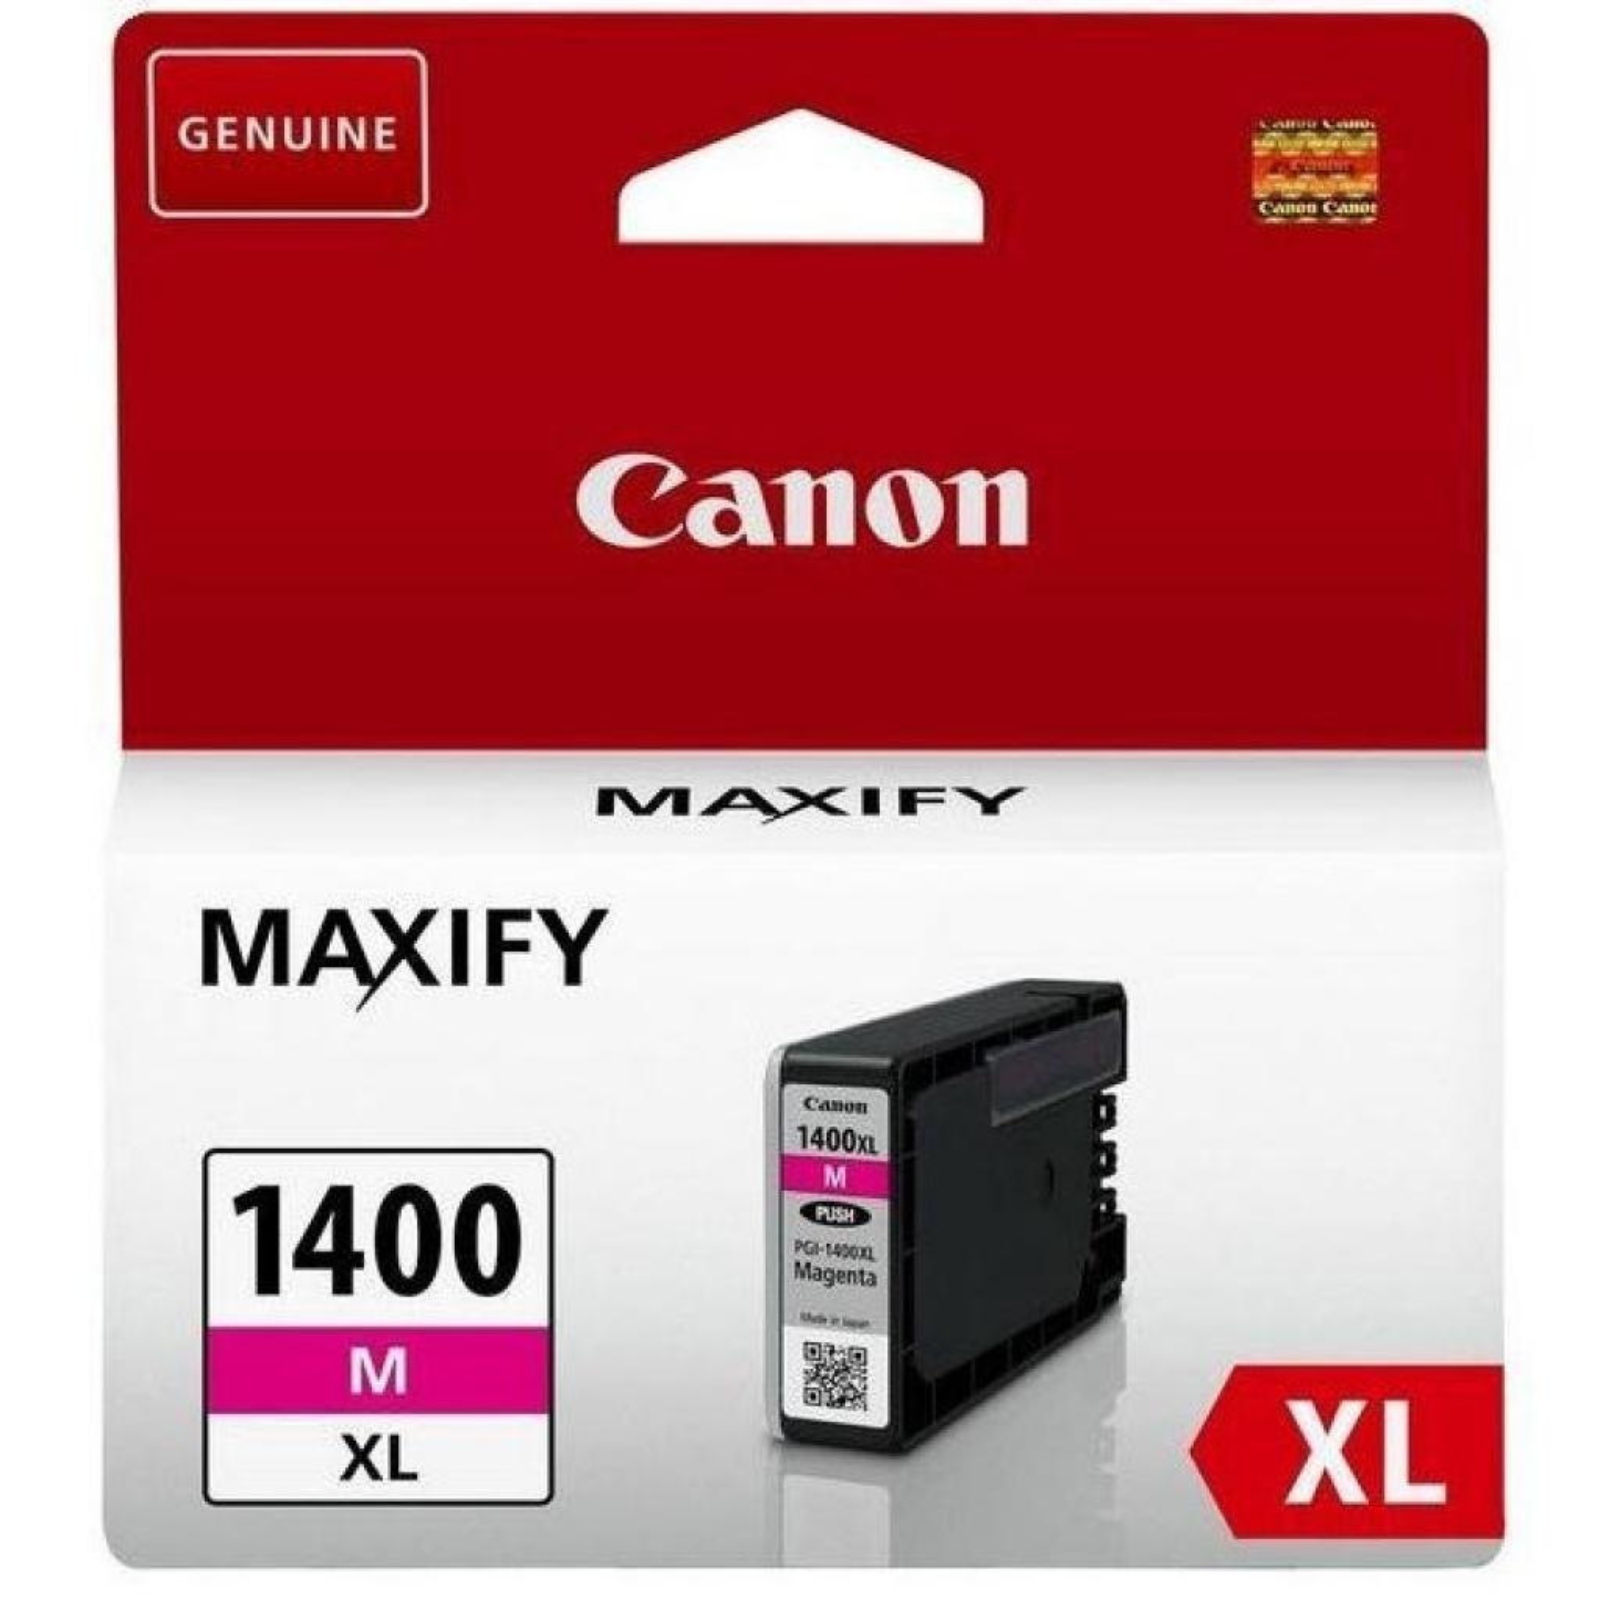 Картридж Canon PGI-1400 XL Magenta (9203B001)